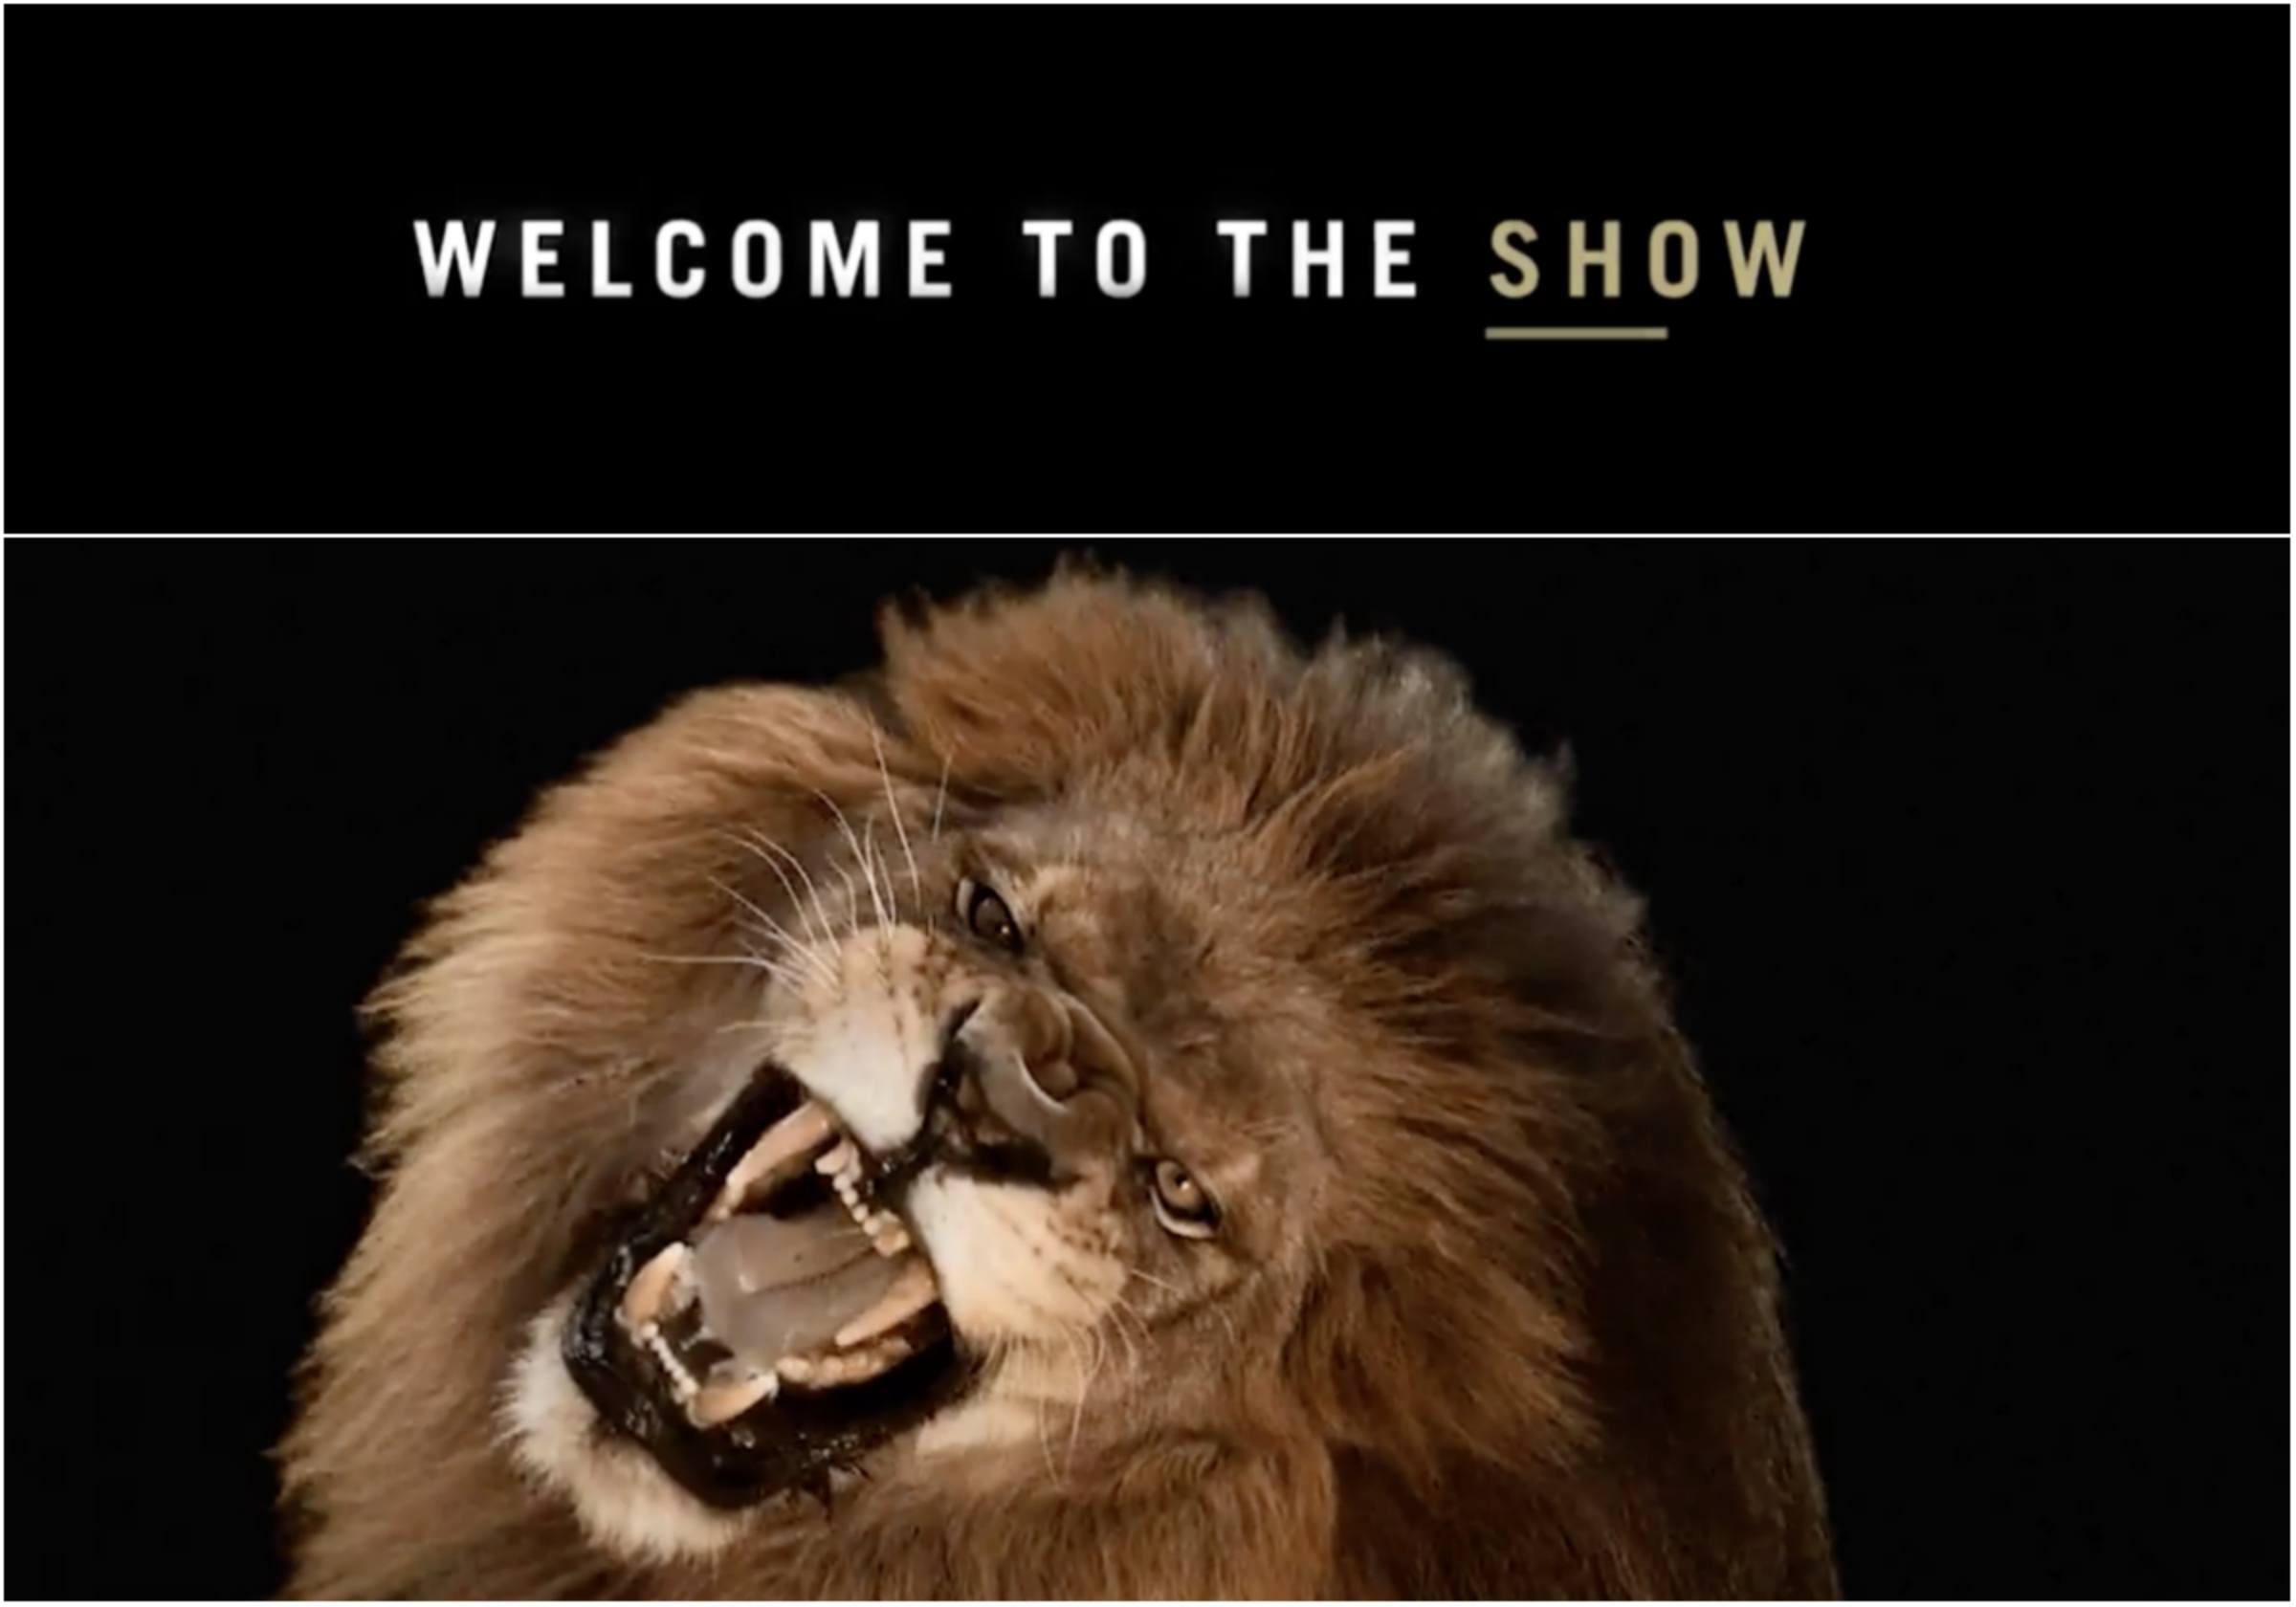 MGM Resorts Las Vegas marketing commercial